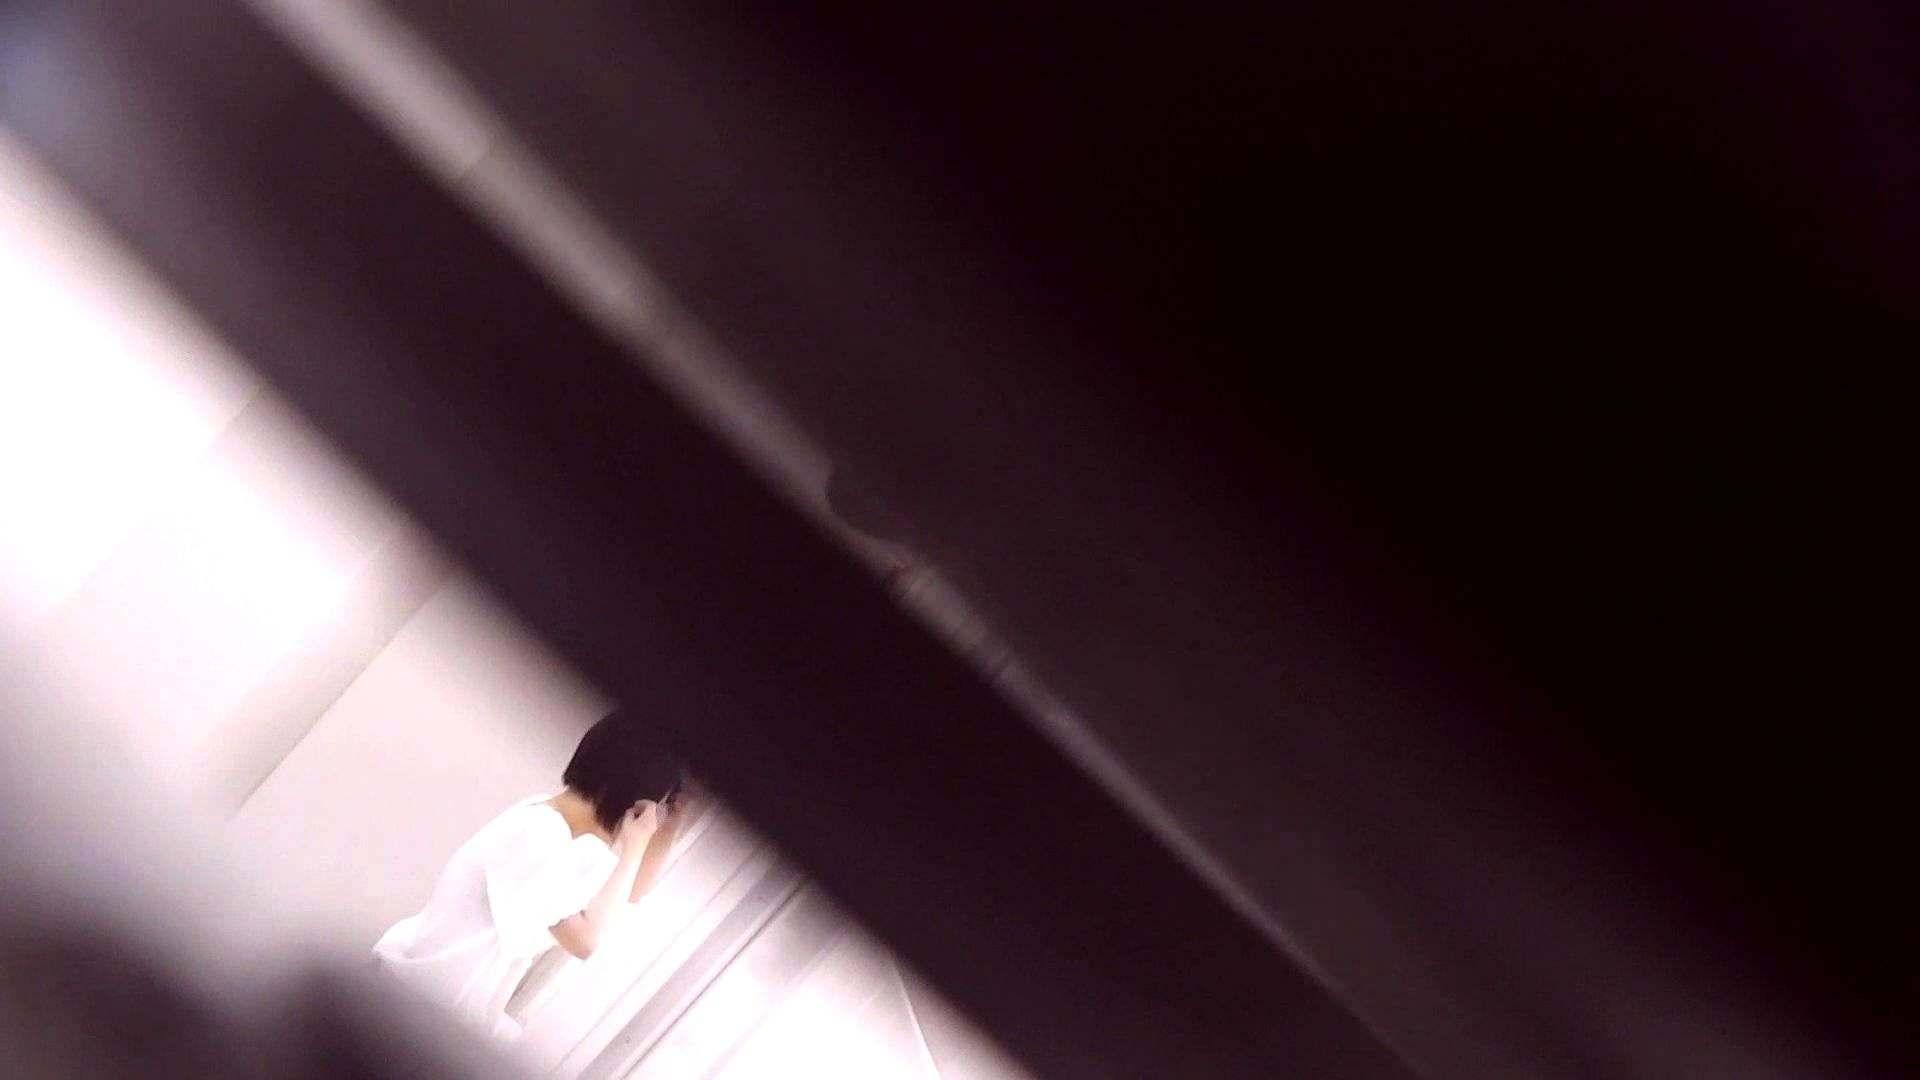 vol.17 命がけ潜伏洗面所! 張り裂けんばかりの大物 プライベート ワレメ無修正動画無料 88pic 55